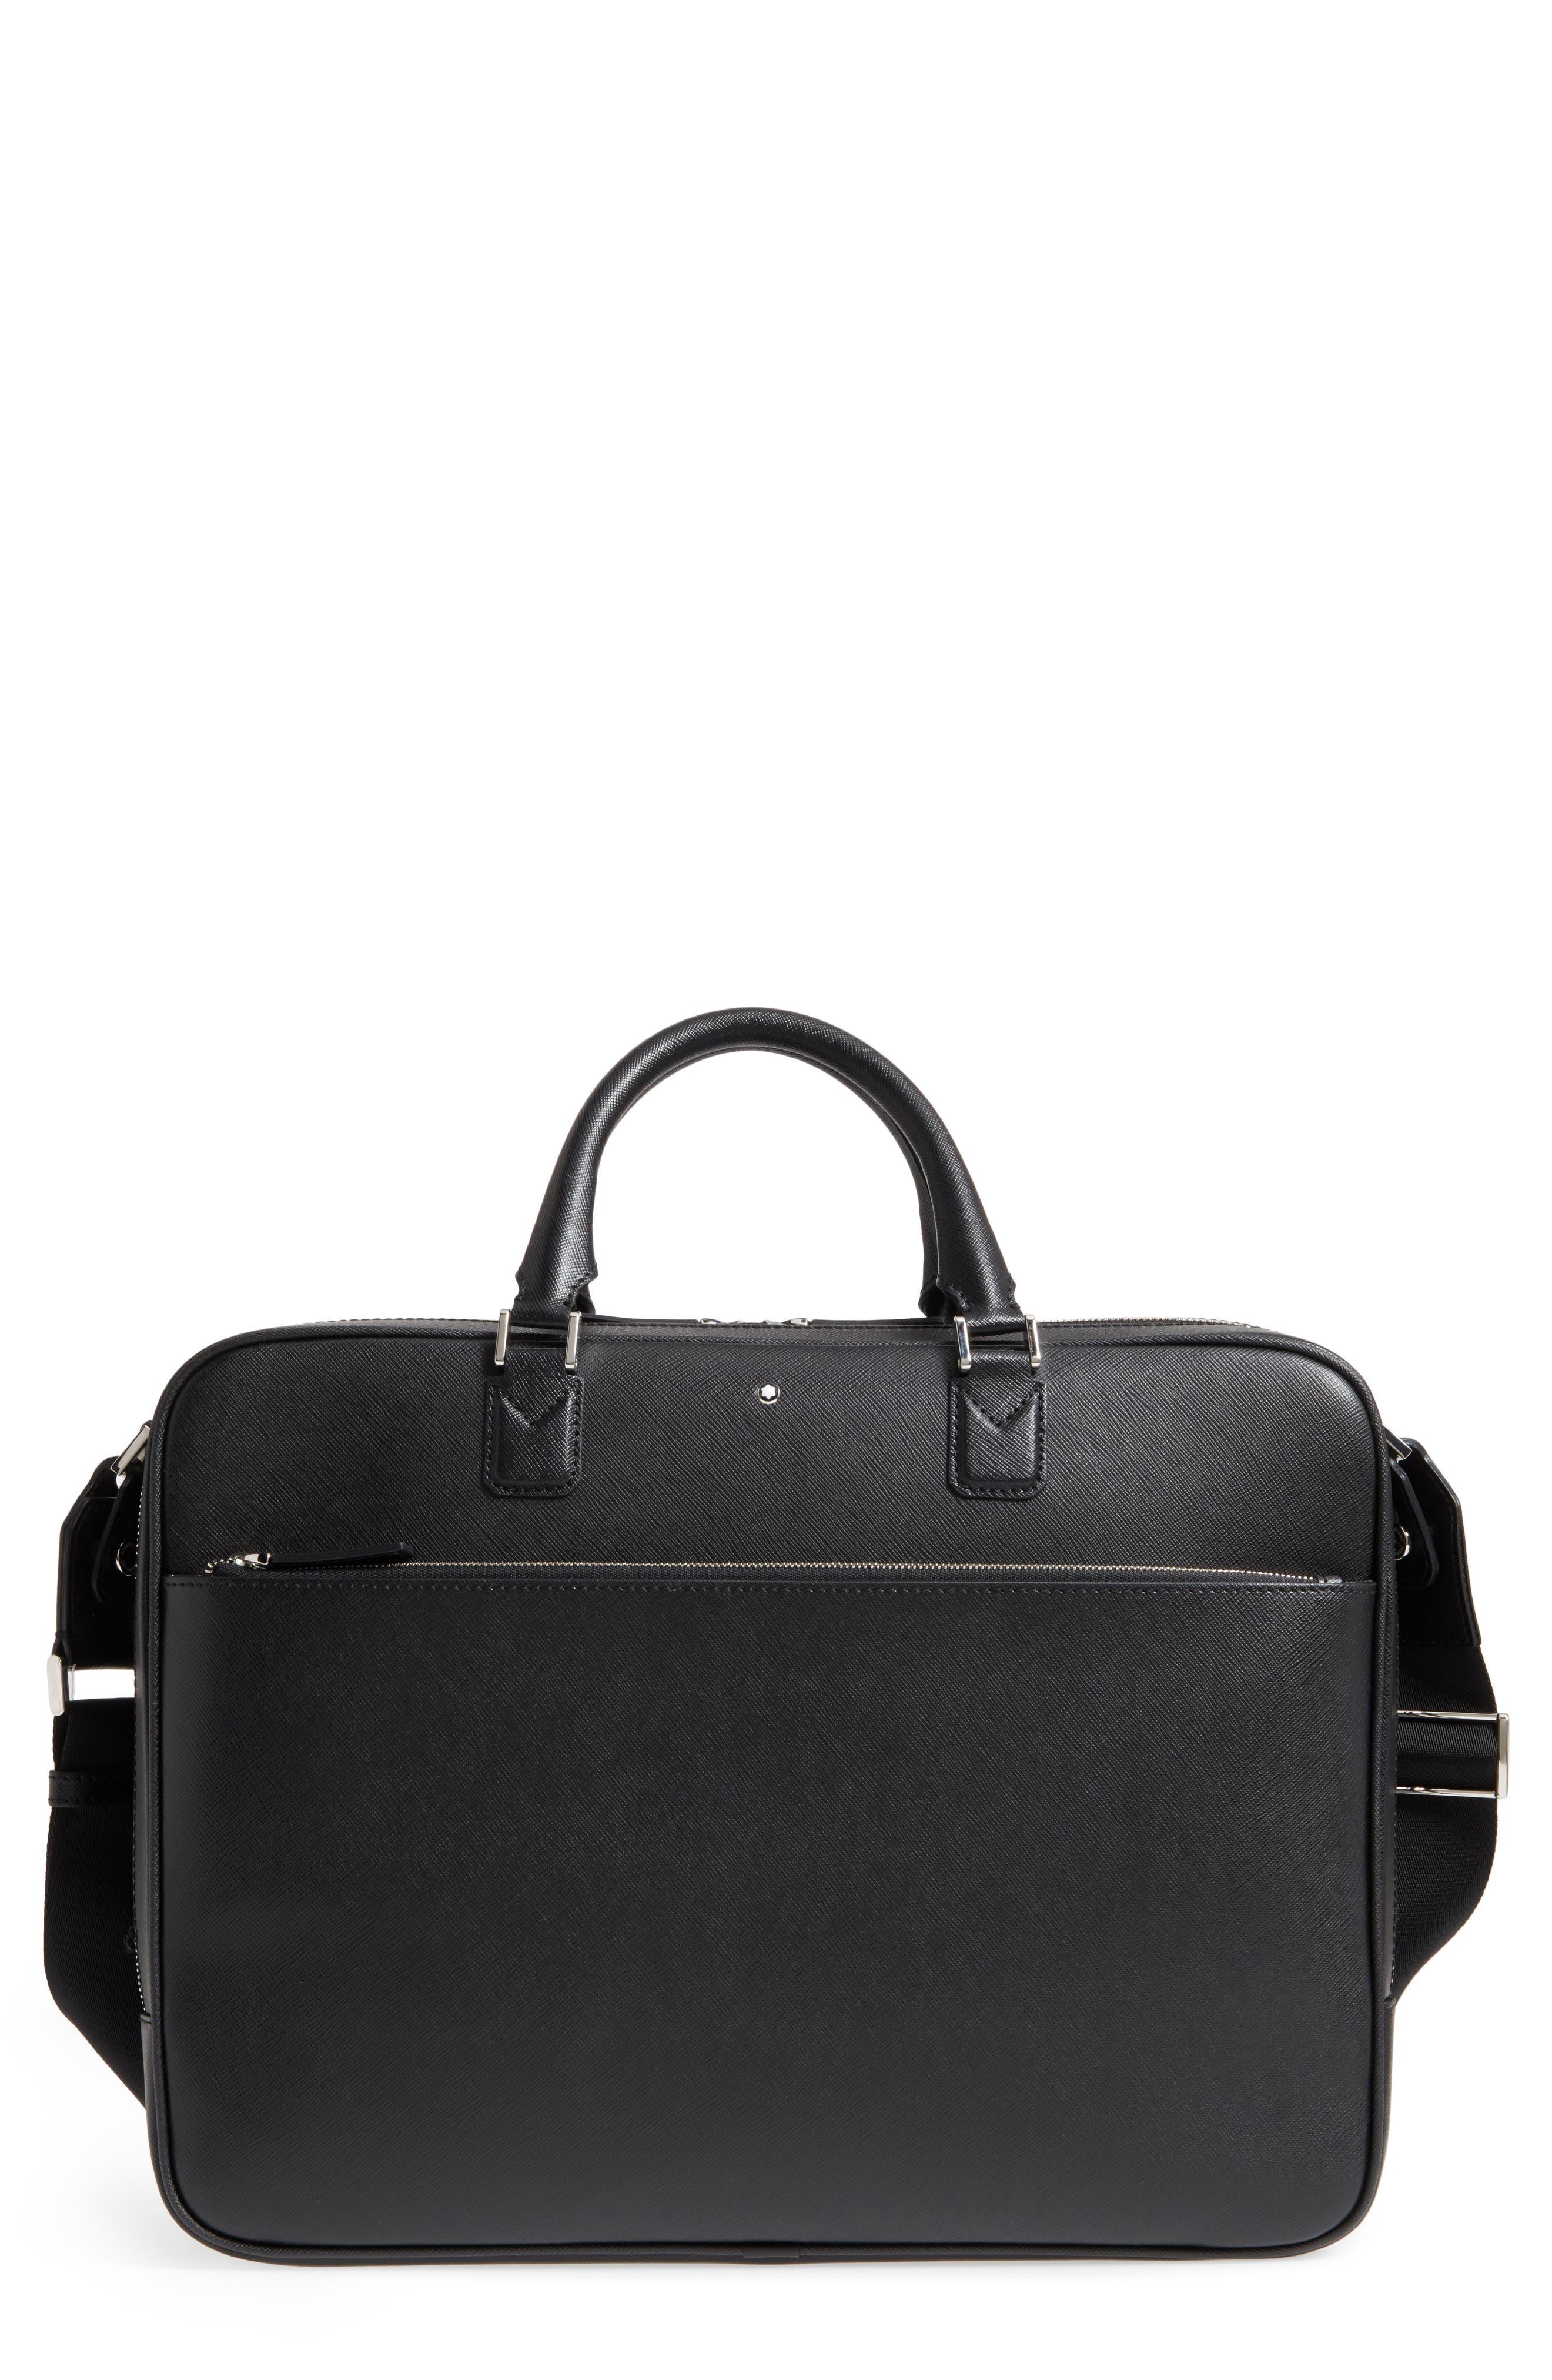 MONTBLANC Sartorial Leather Briefcase, Main, color, 001